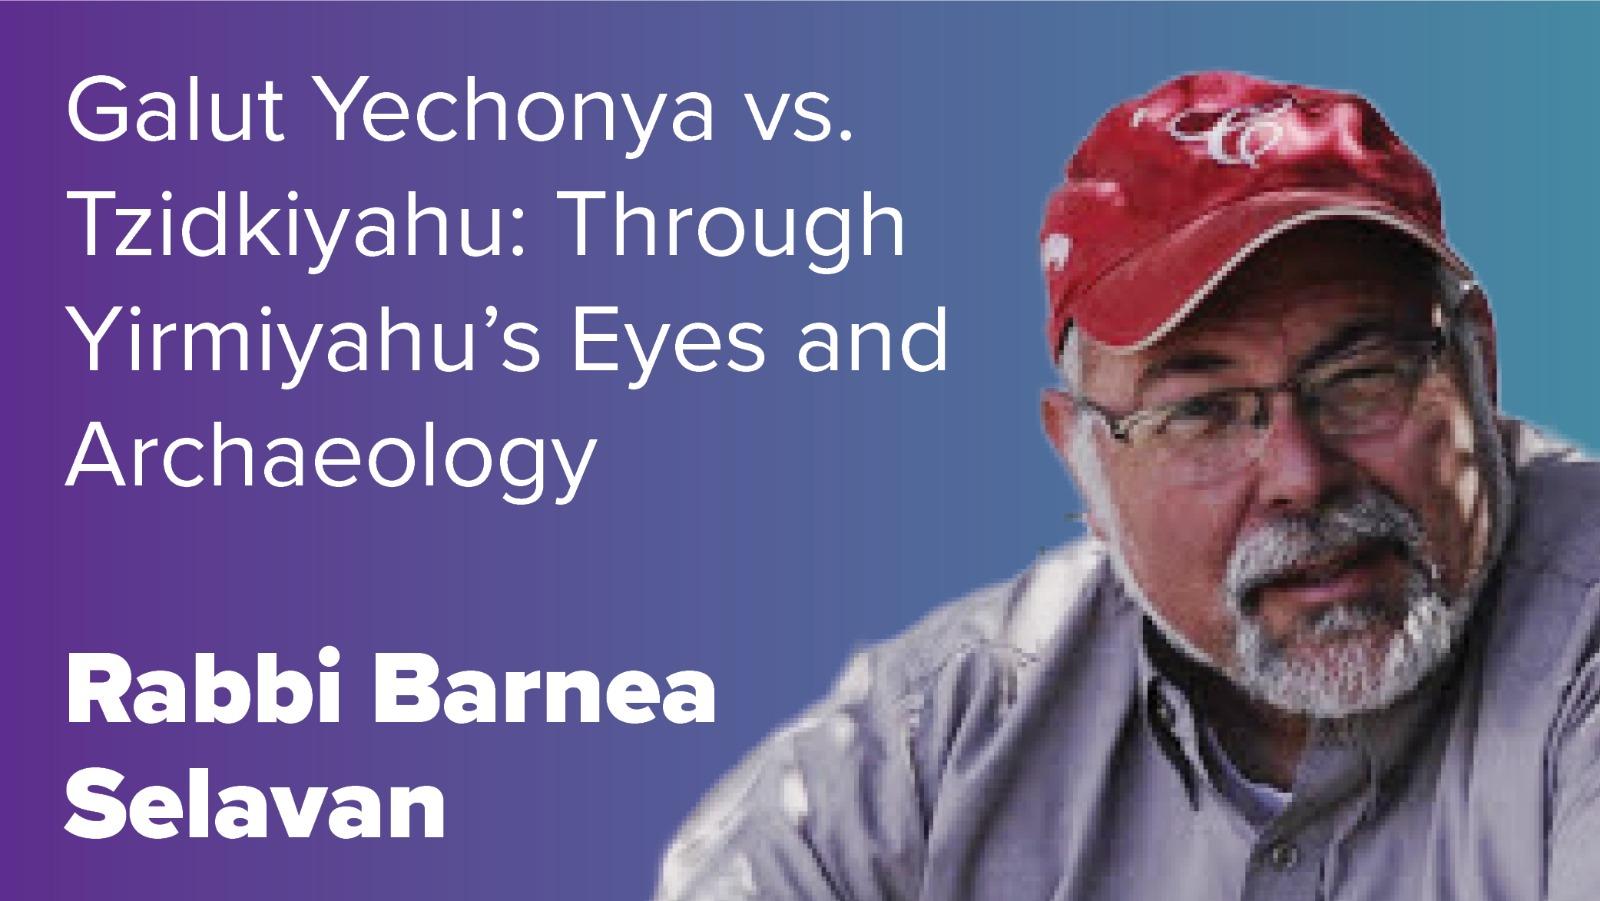 Galut Yechonya vs. Tzidkiyahu